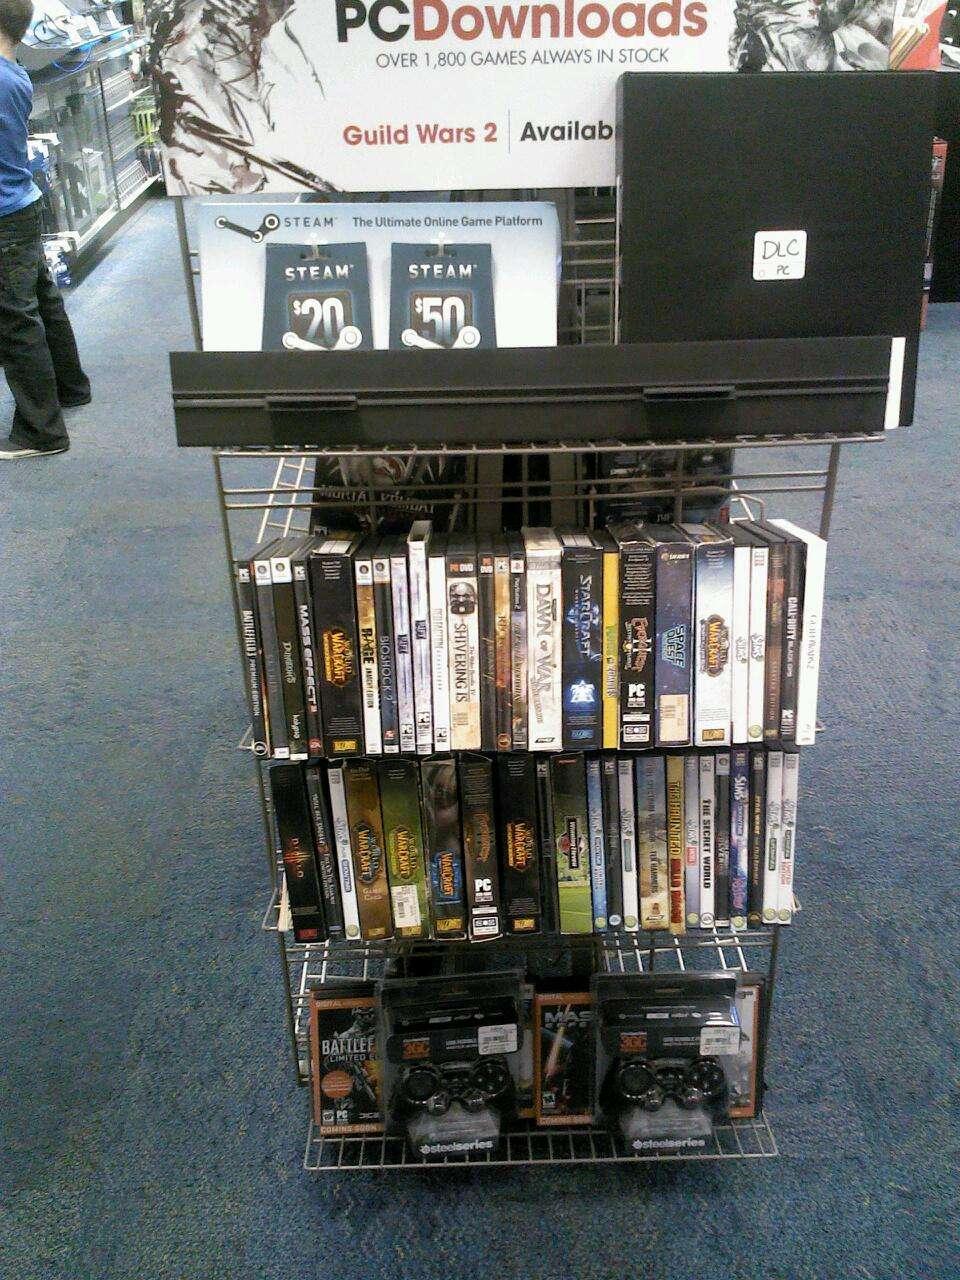 GameStop - store  | Photo 3 of 4 | Address: 3849 S Delsea Dr, Vineland, NJ 08360, USA | Phone: (856) 327-8035